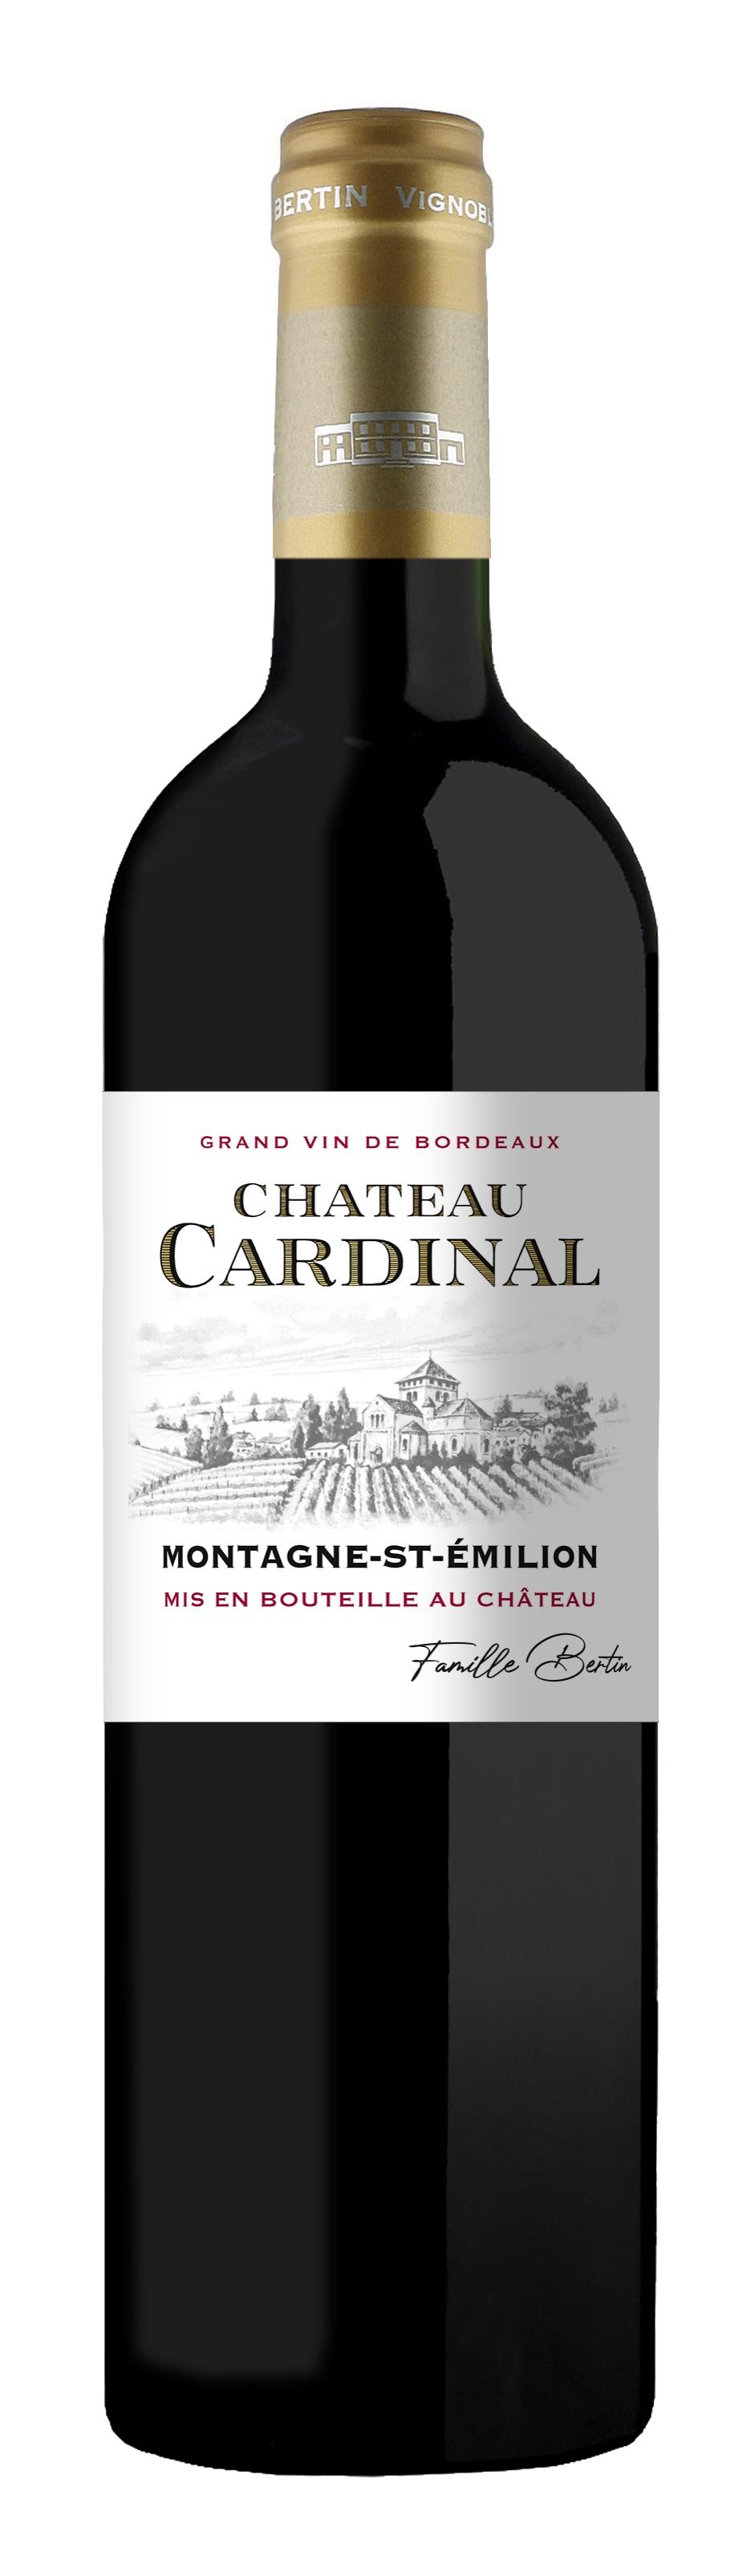 Chateau Cardinal